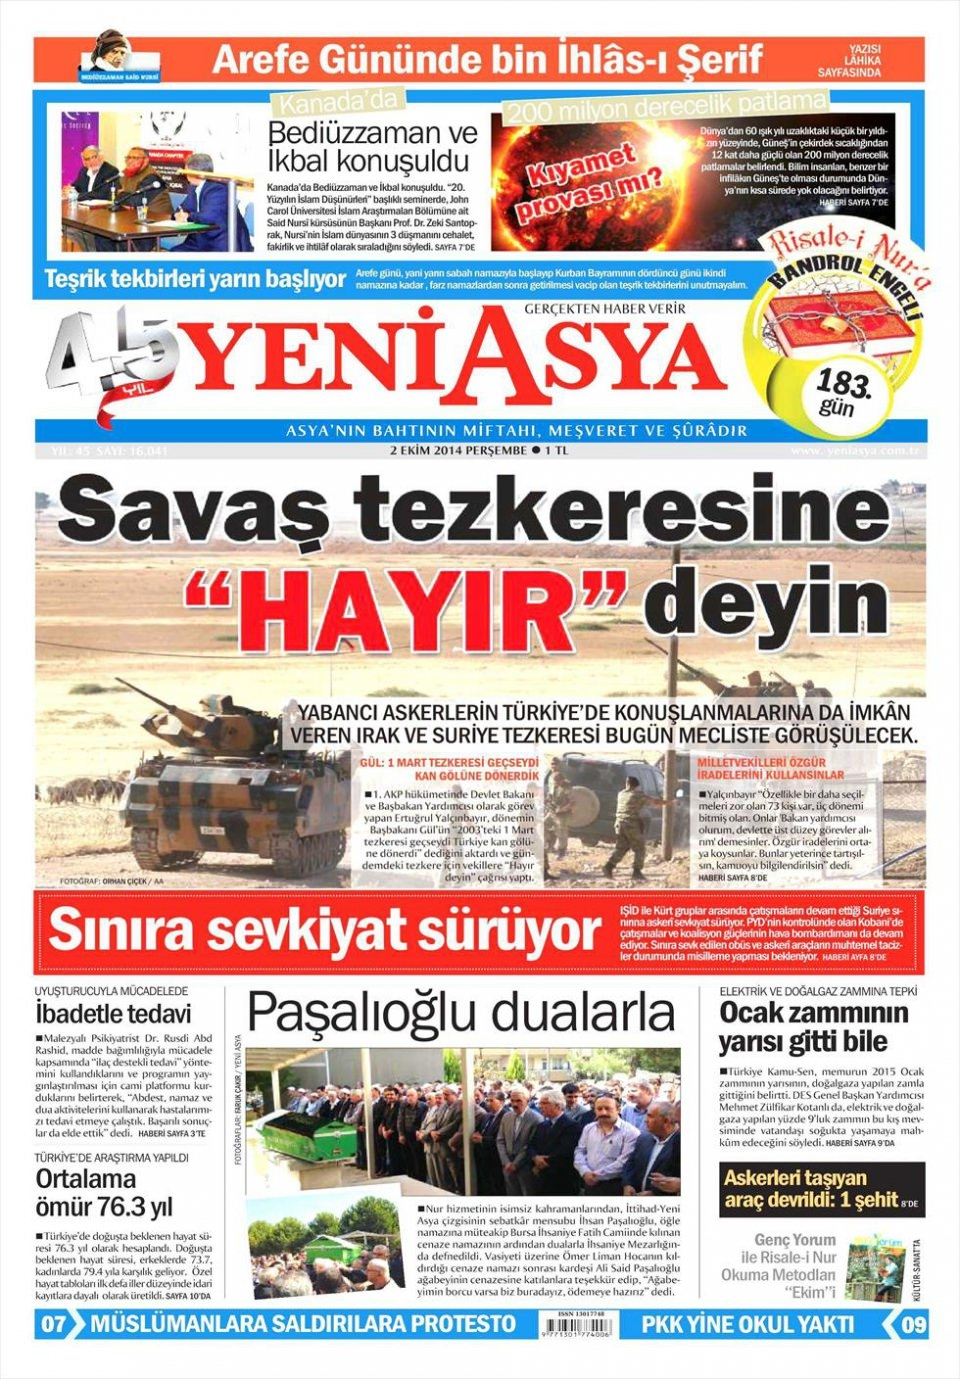 2 Ekim 2014 gazete manşetleri 24